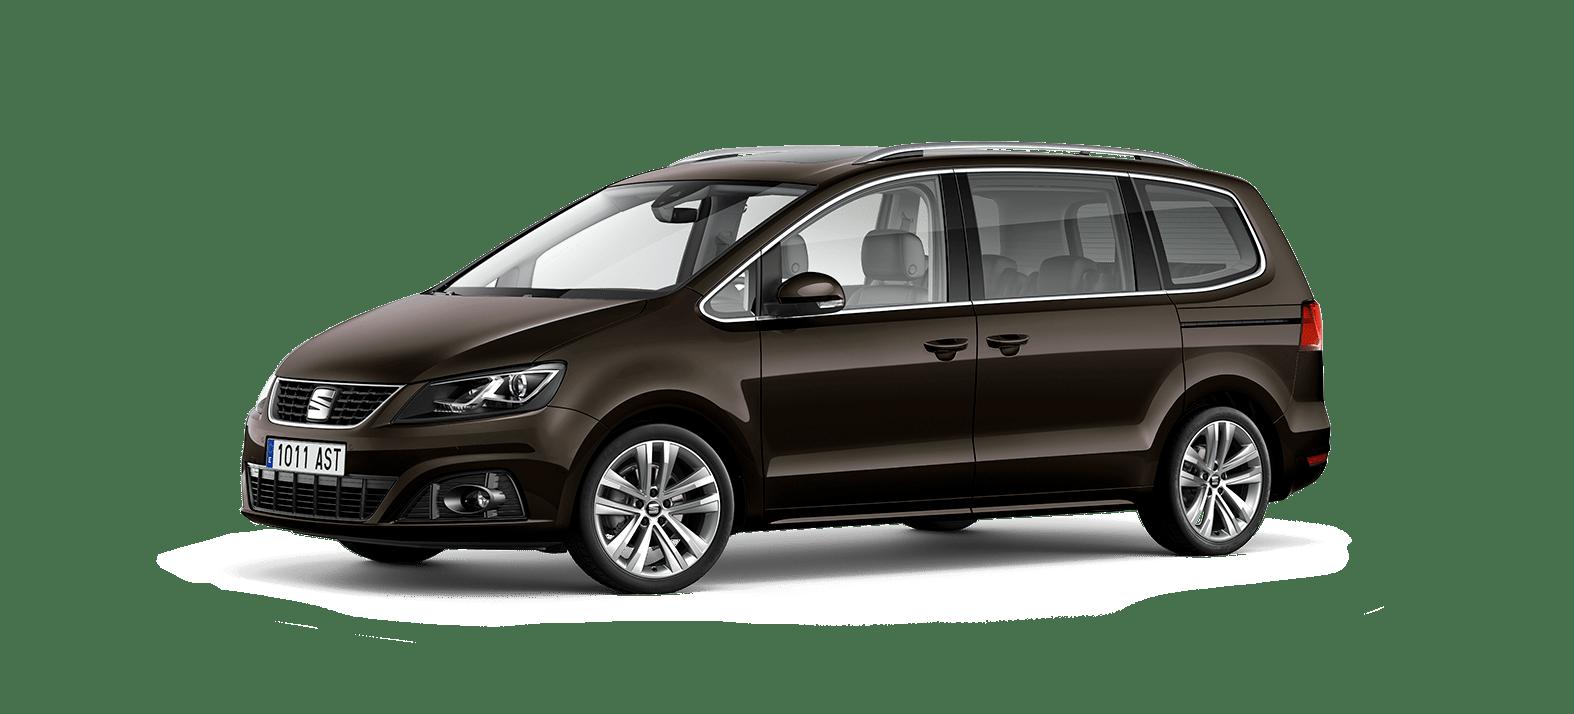 VW Seat Alhambra